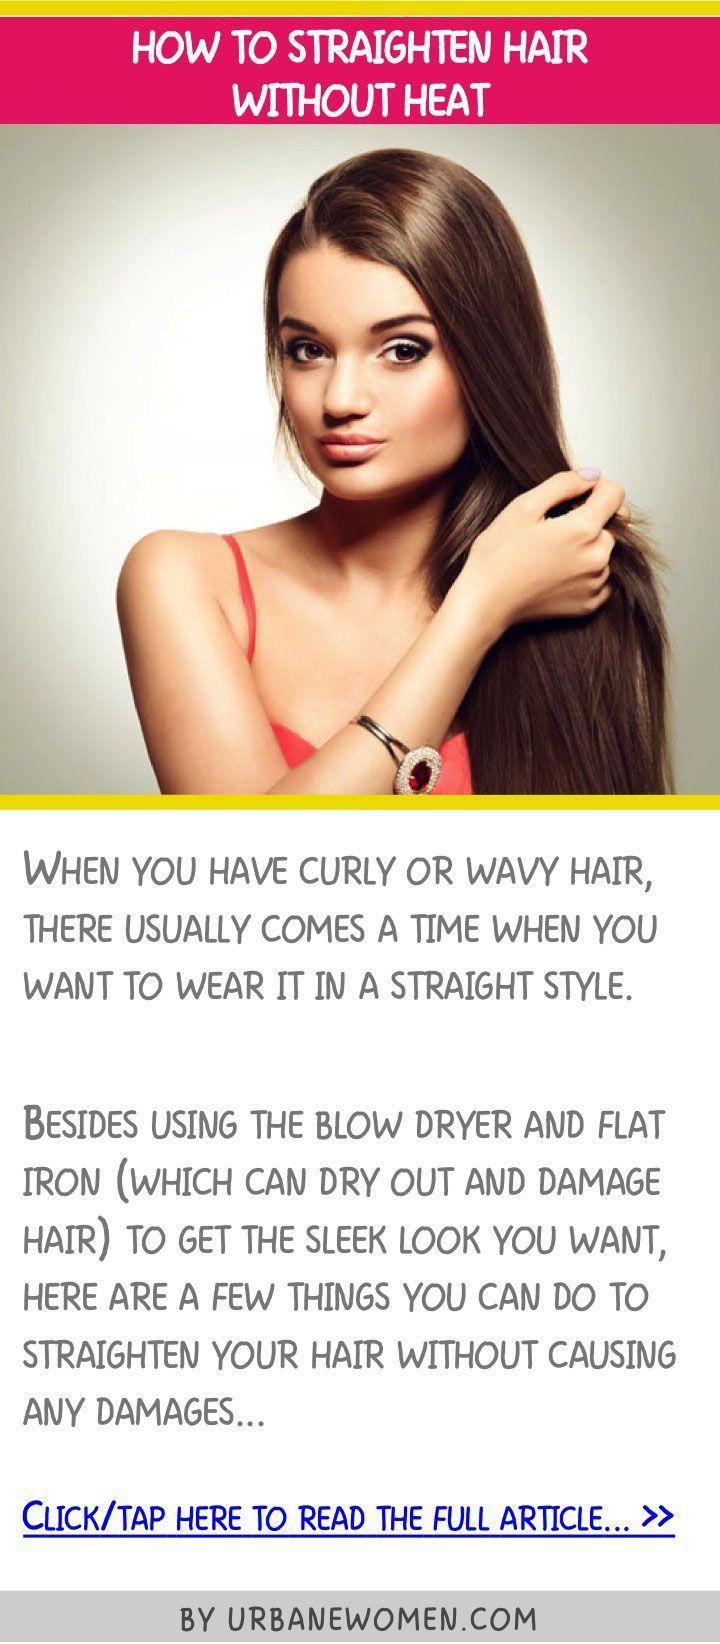 electra hair brush straightener